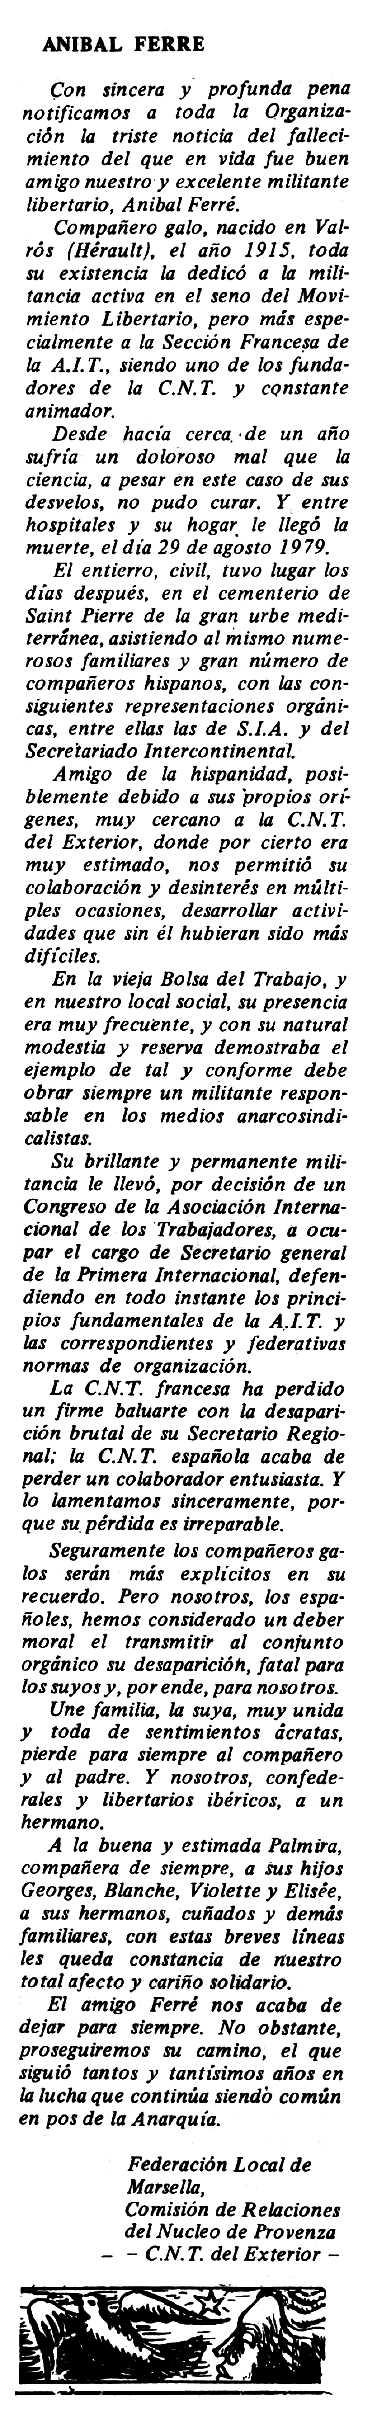 "Necrològica d'Anibal Ferré Gómez apareguda en el periòdic tolosà ""Espoir"" del 16 de desembre de 1979"